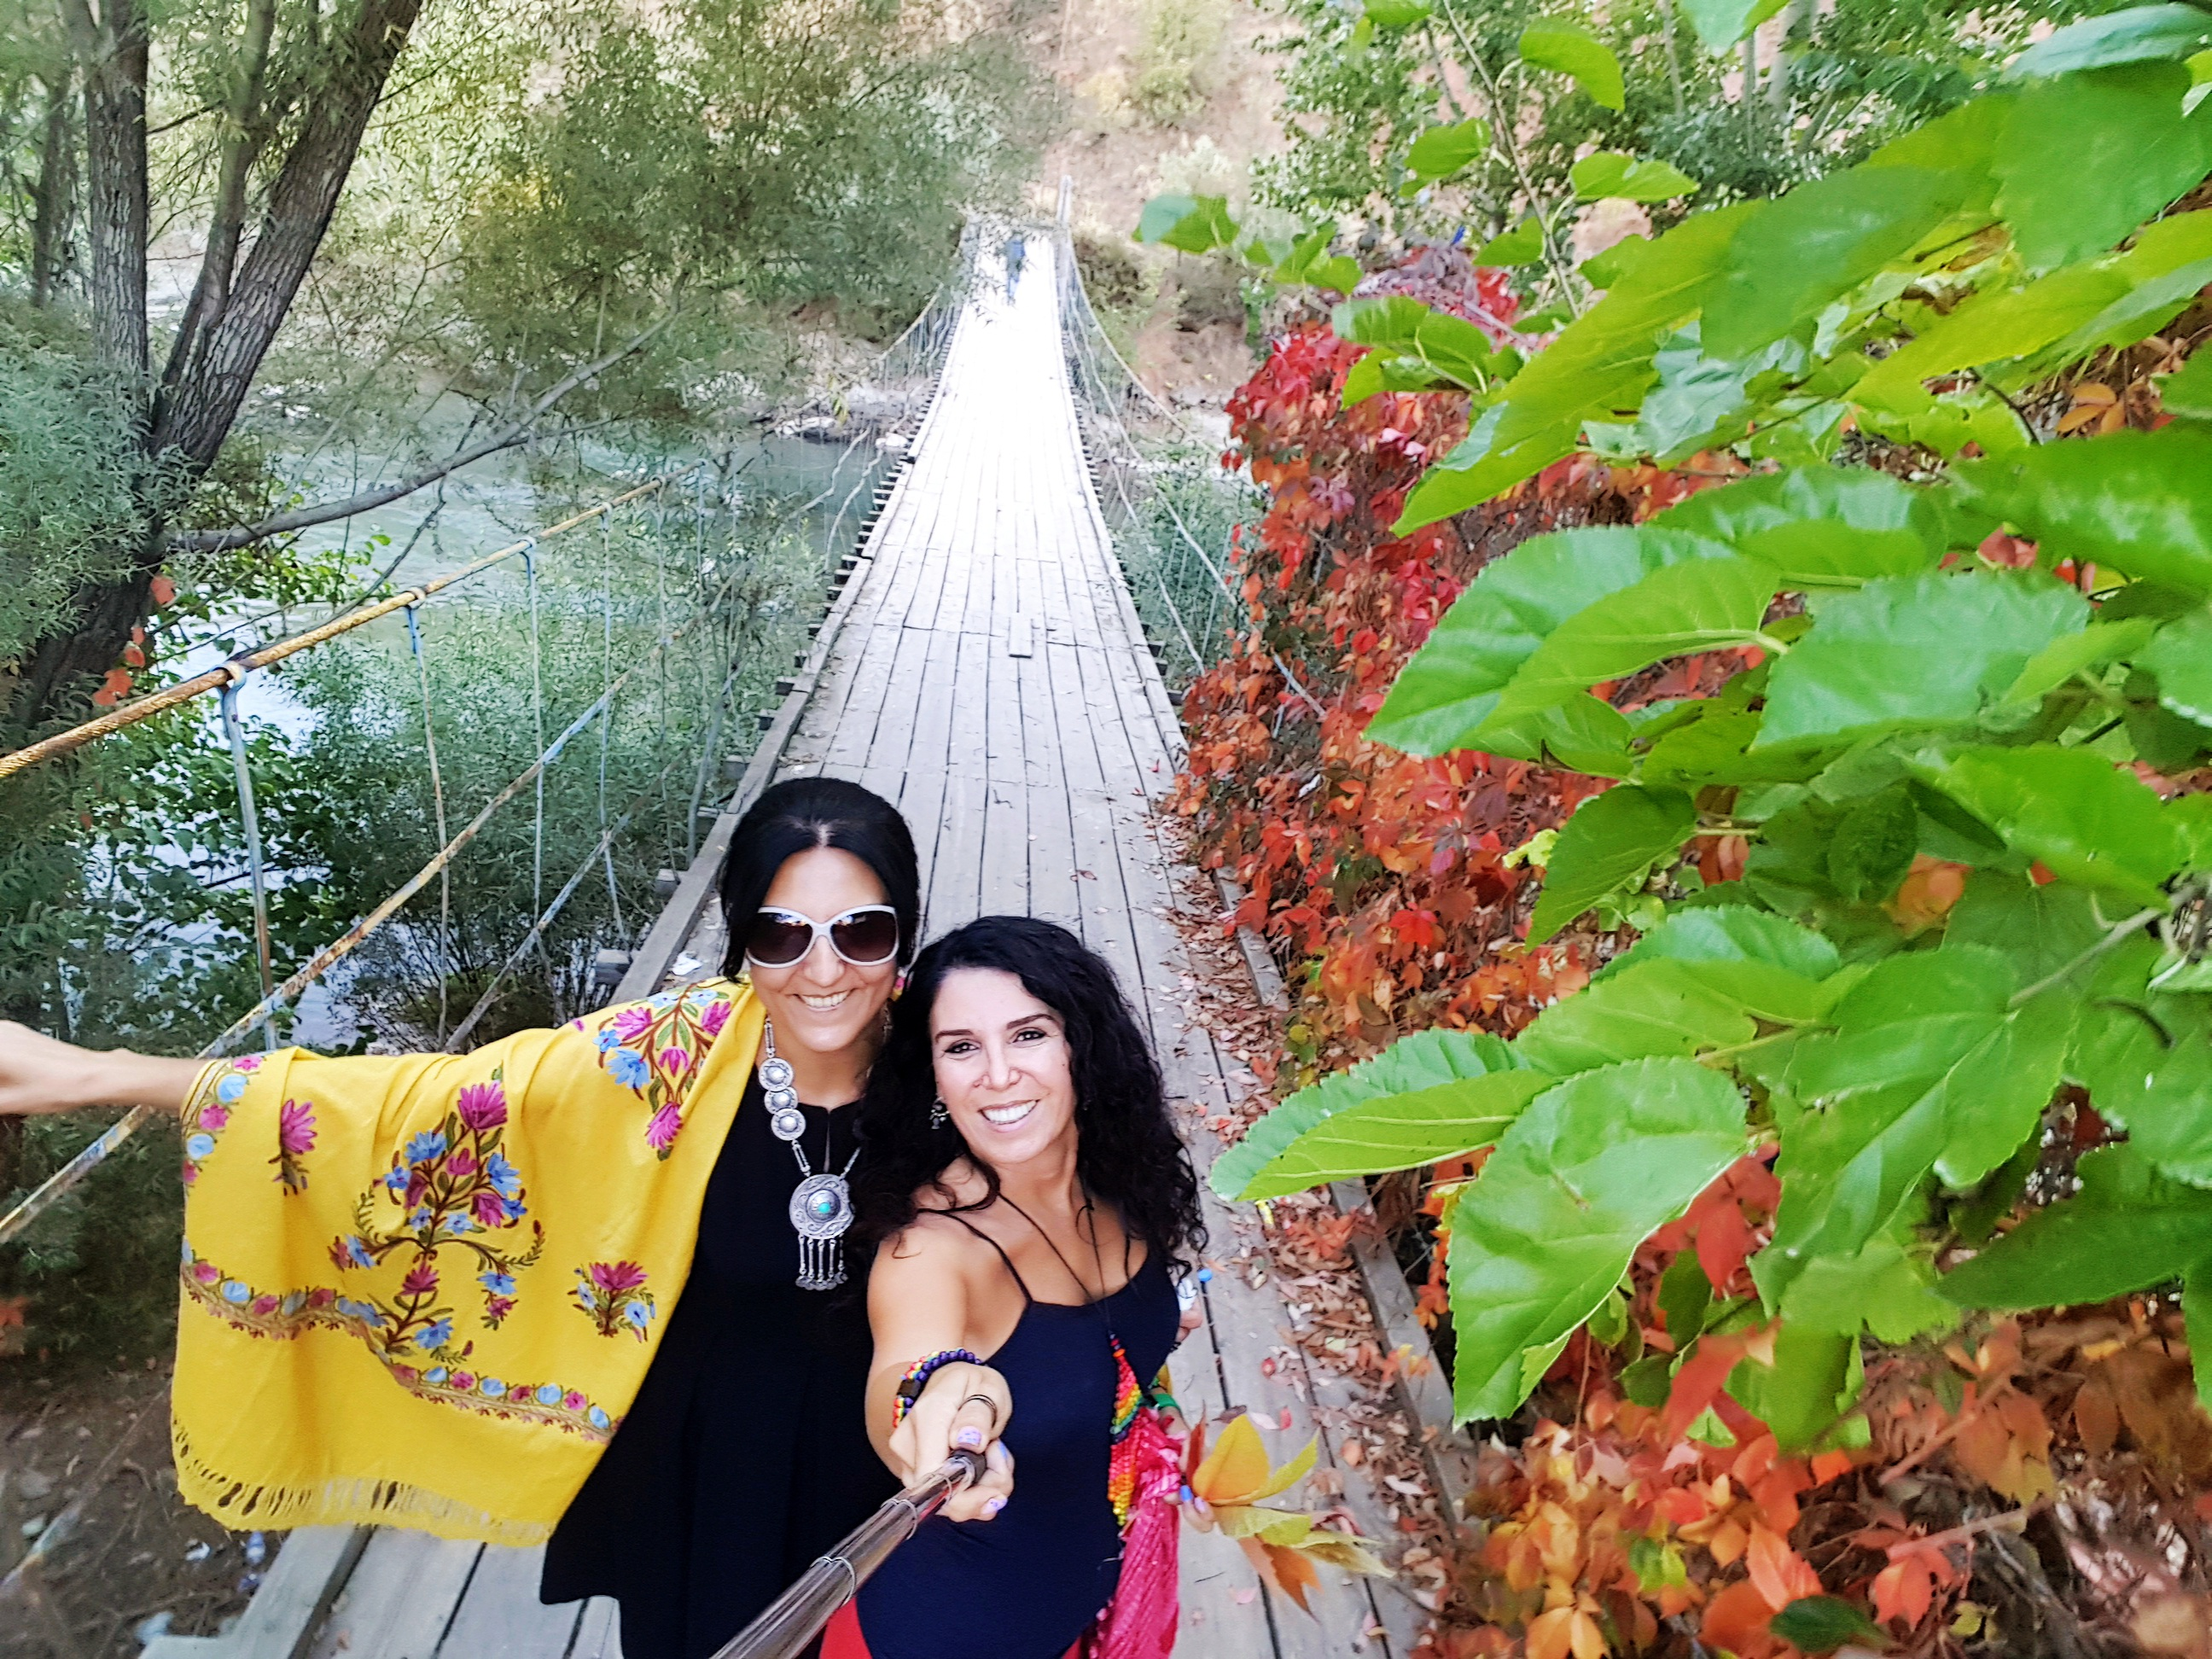 Munzur Çayı asma köprü, Hülya'yla